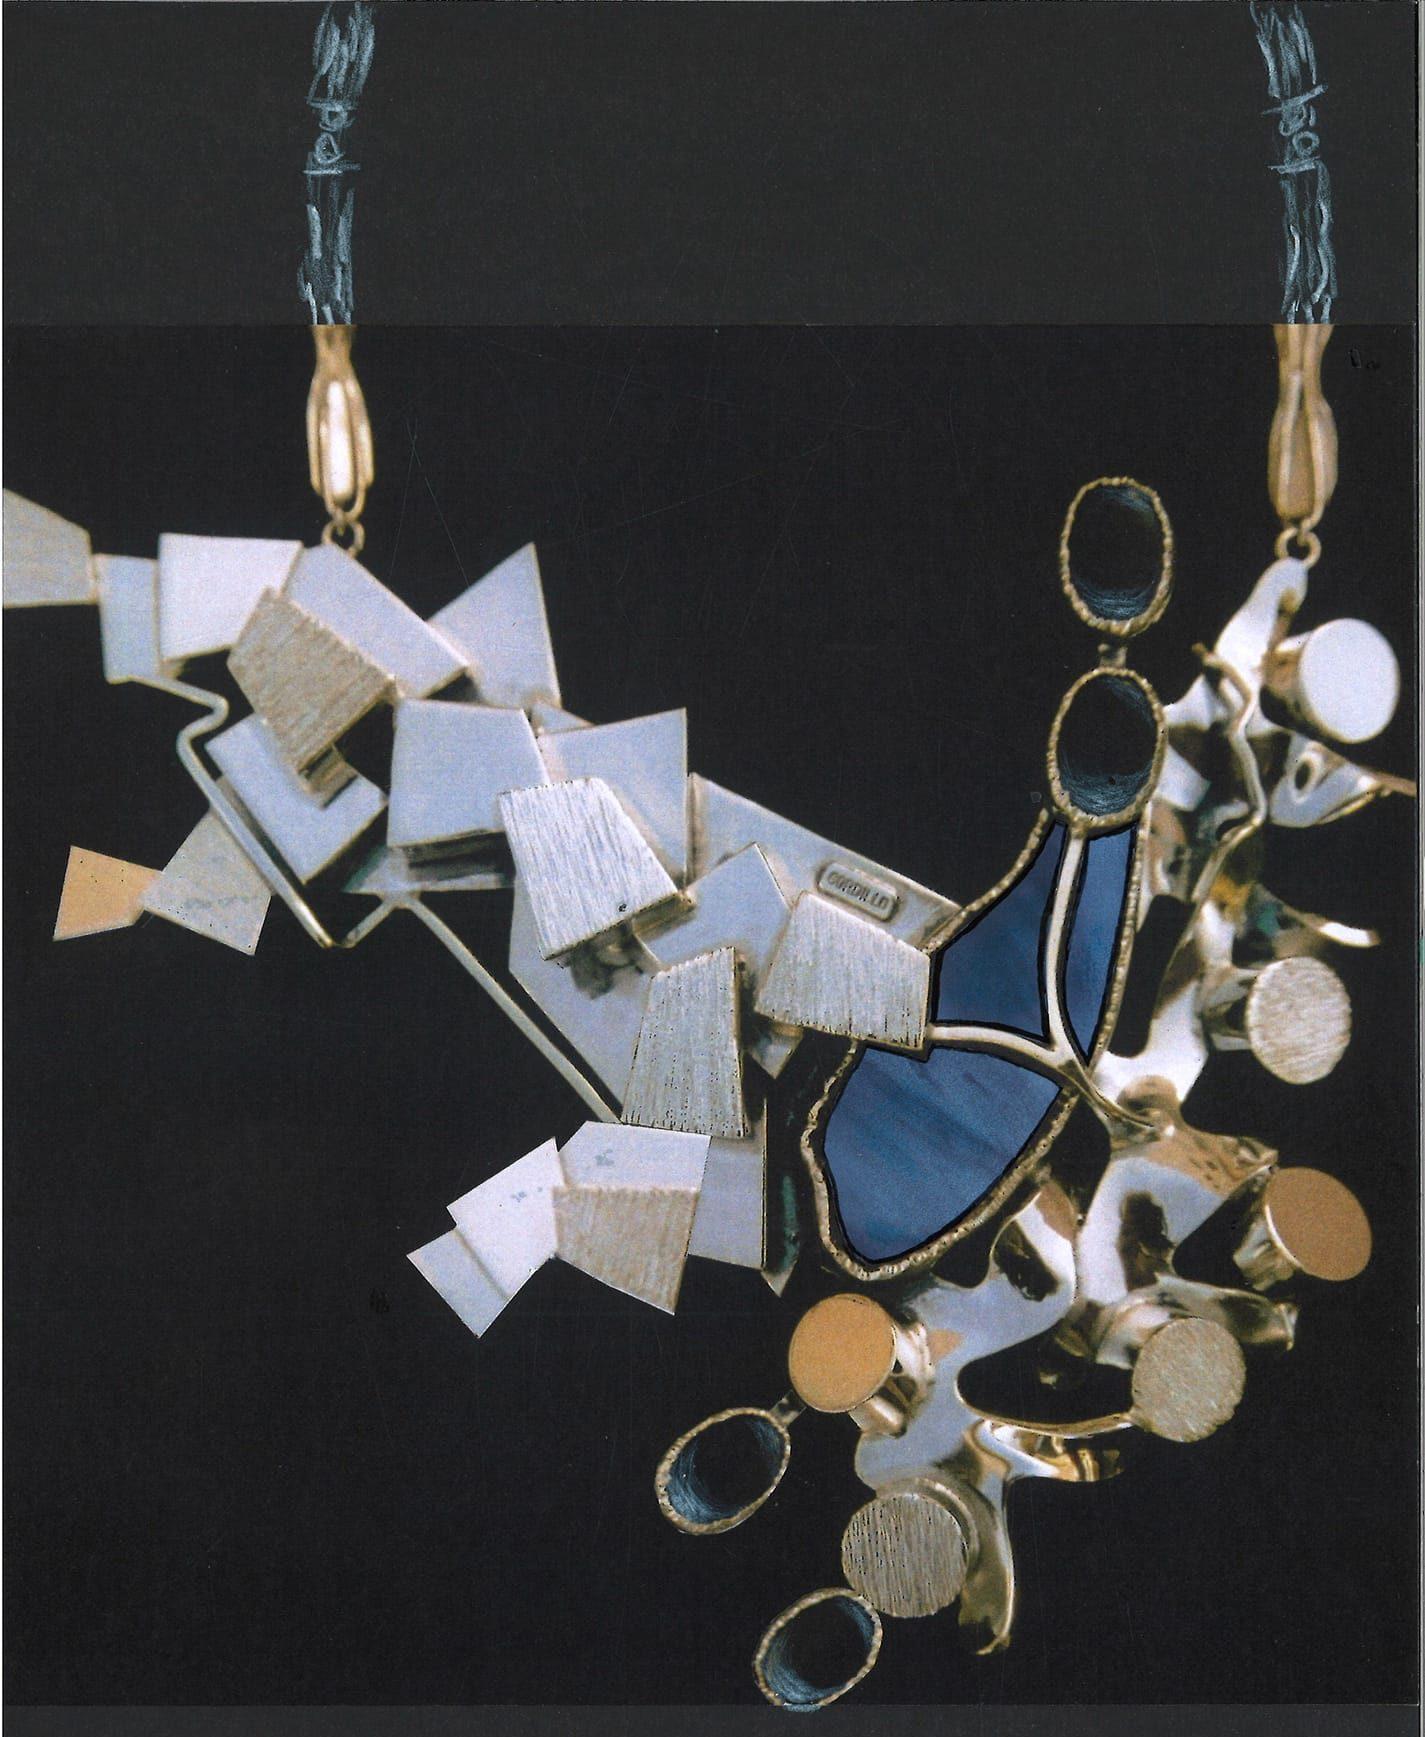 Alberto Gordillo, halssieraad, 1970-1979, zilver, lapis lazuli, onyx